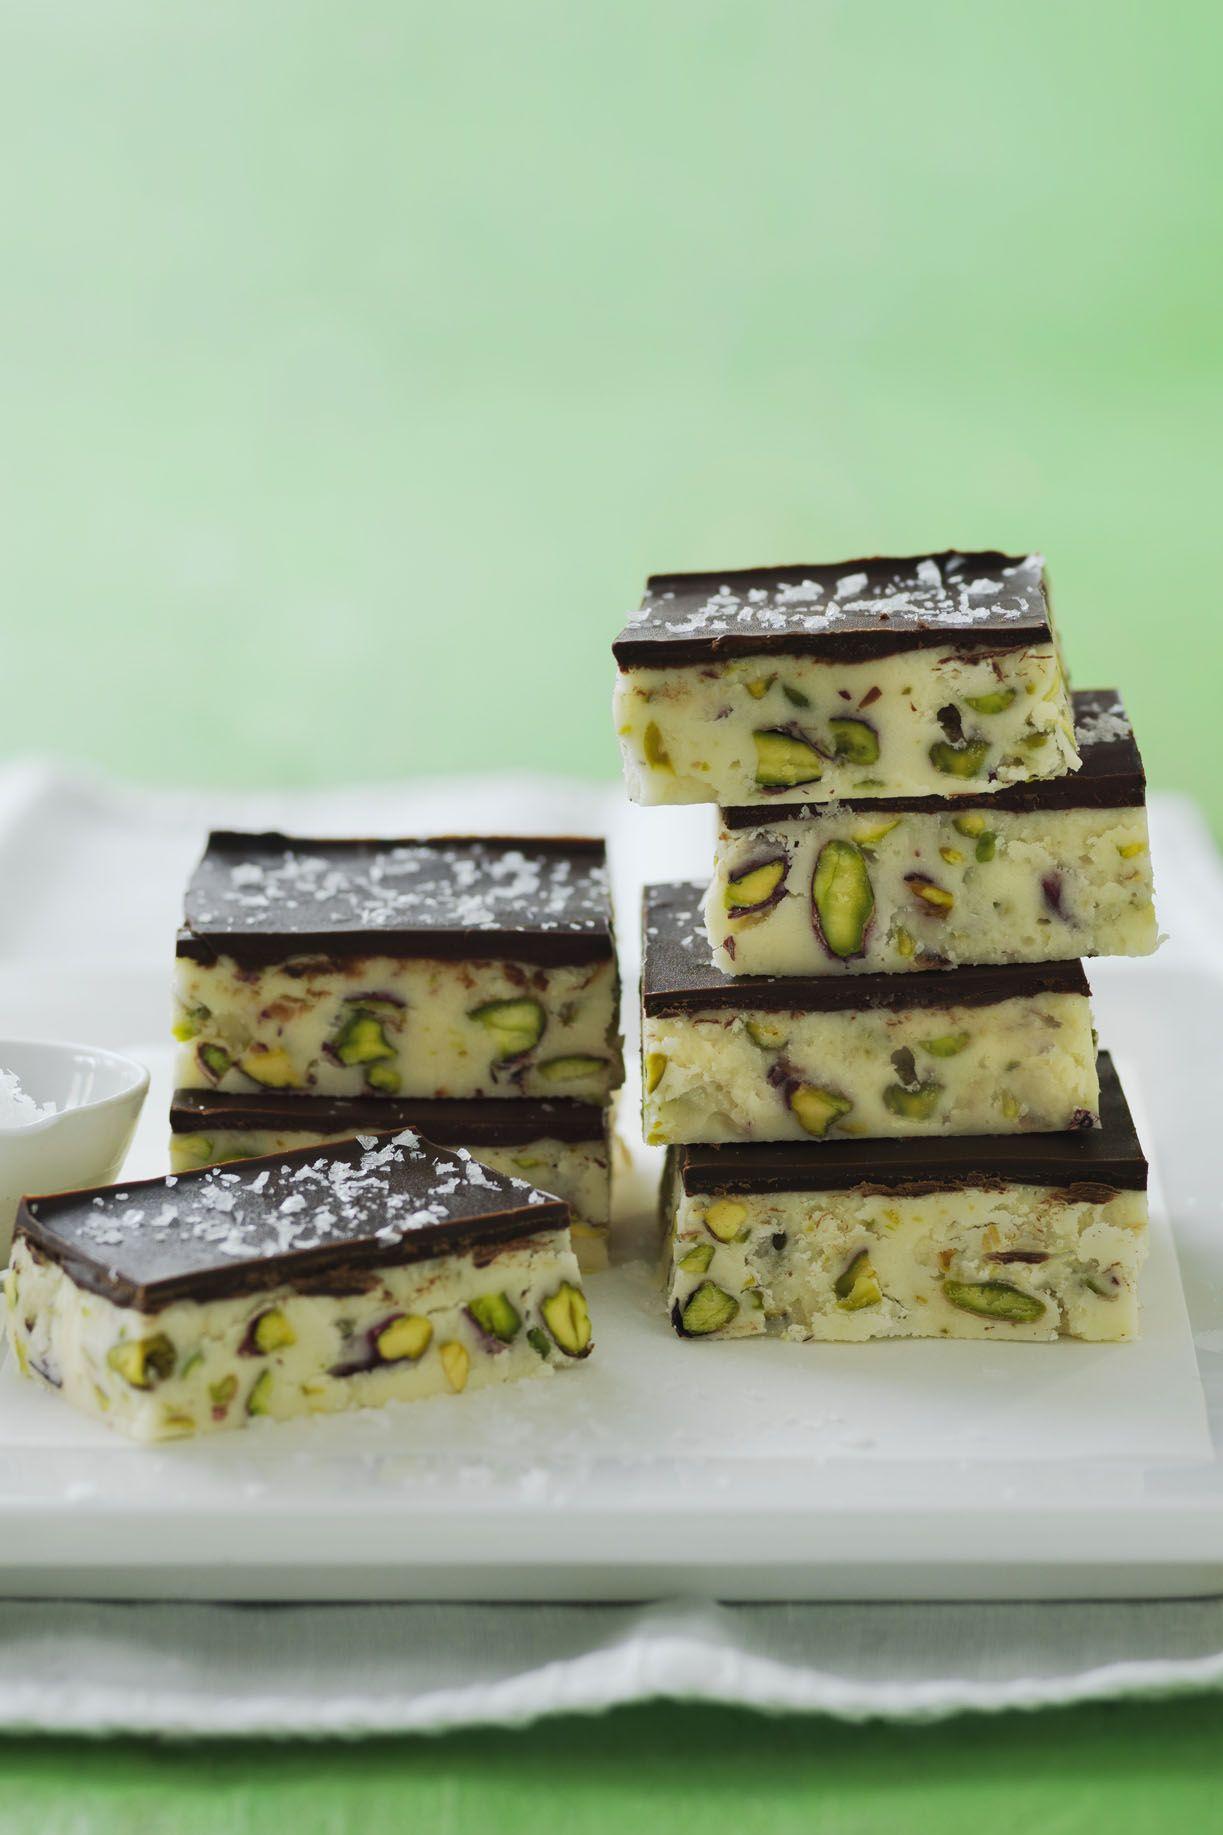 Gluten-Free Desserts - Opera Creams